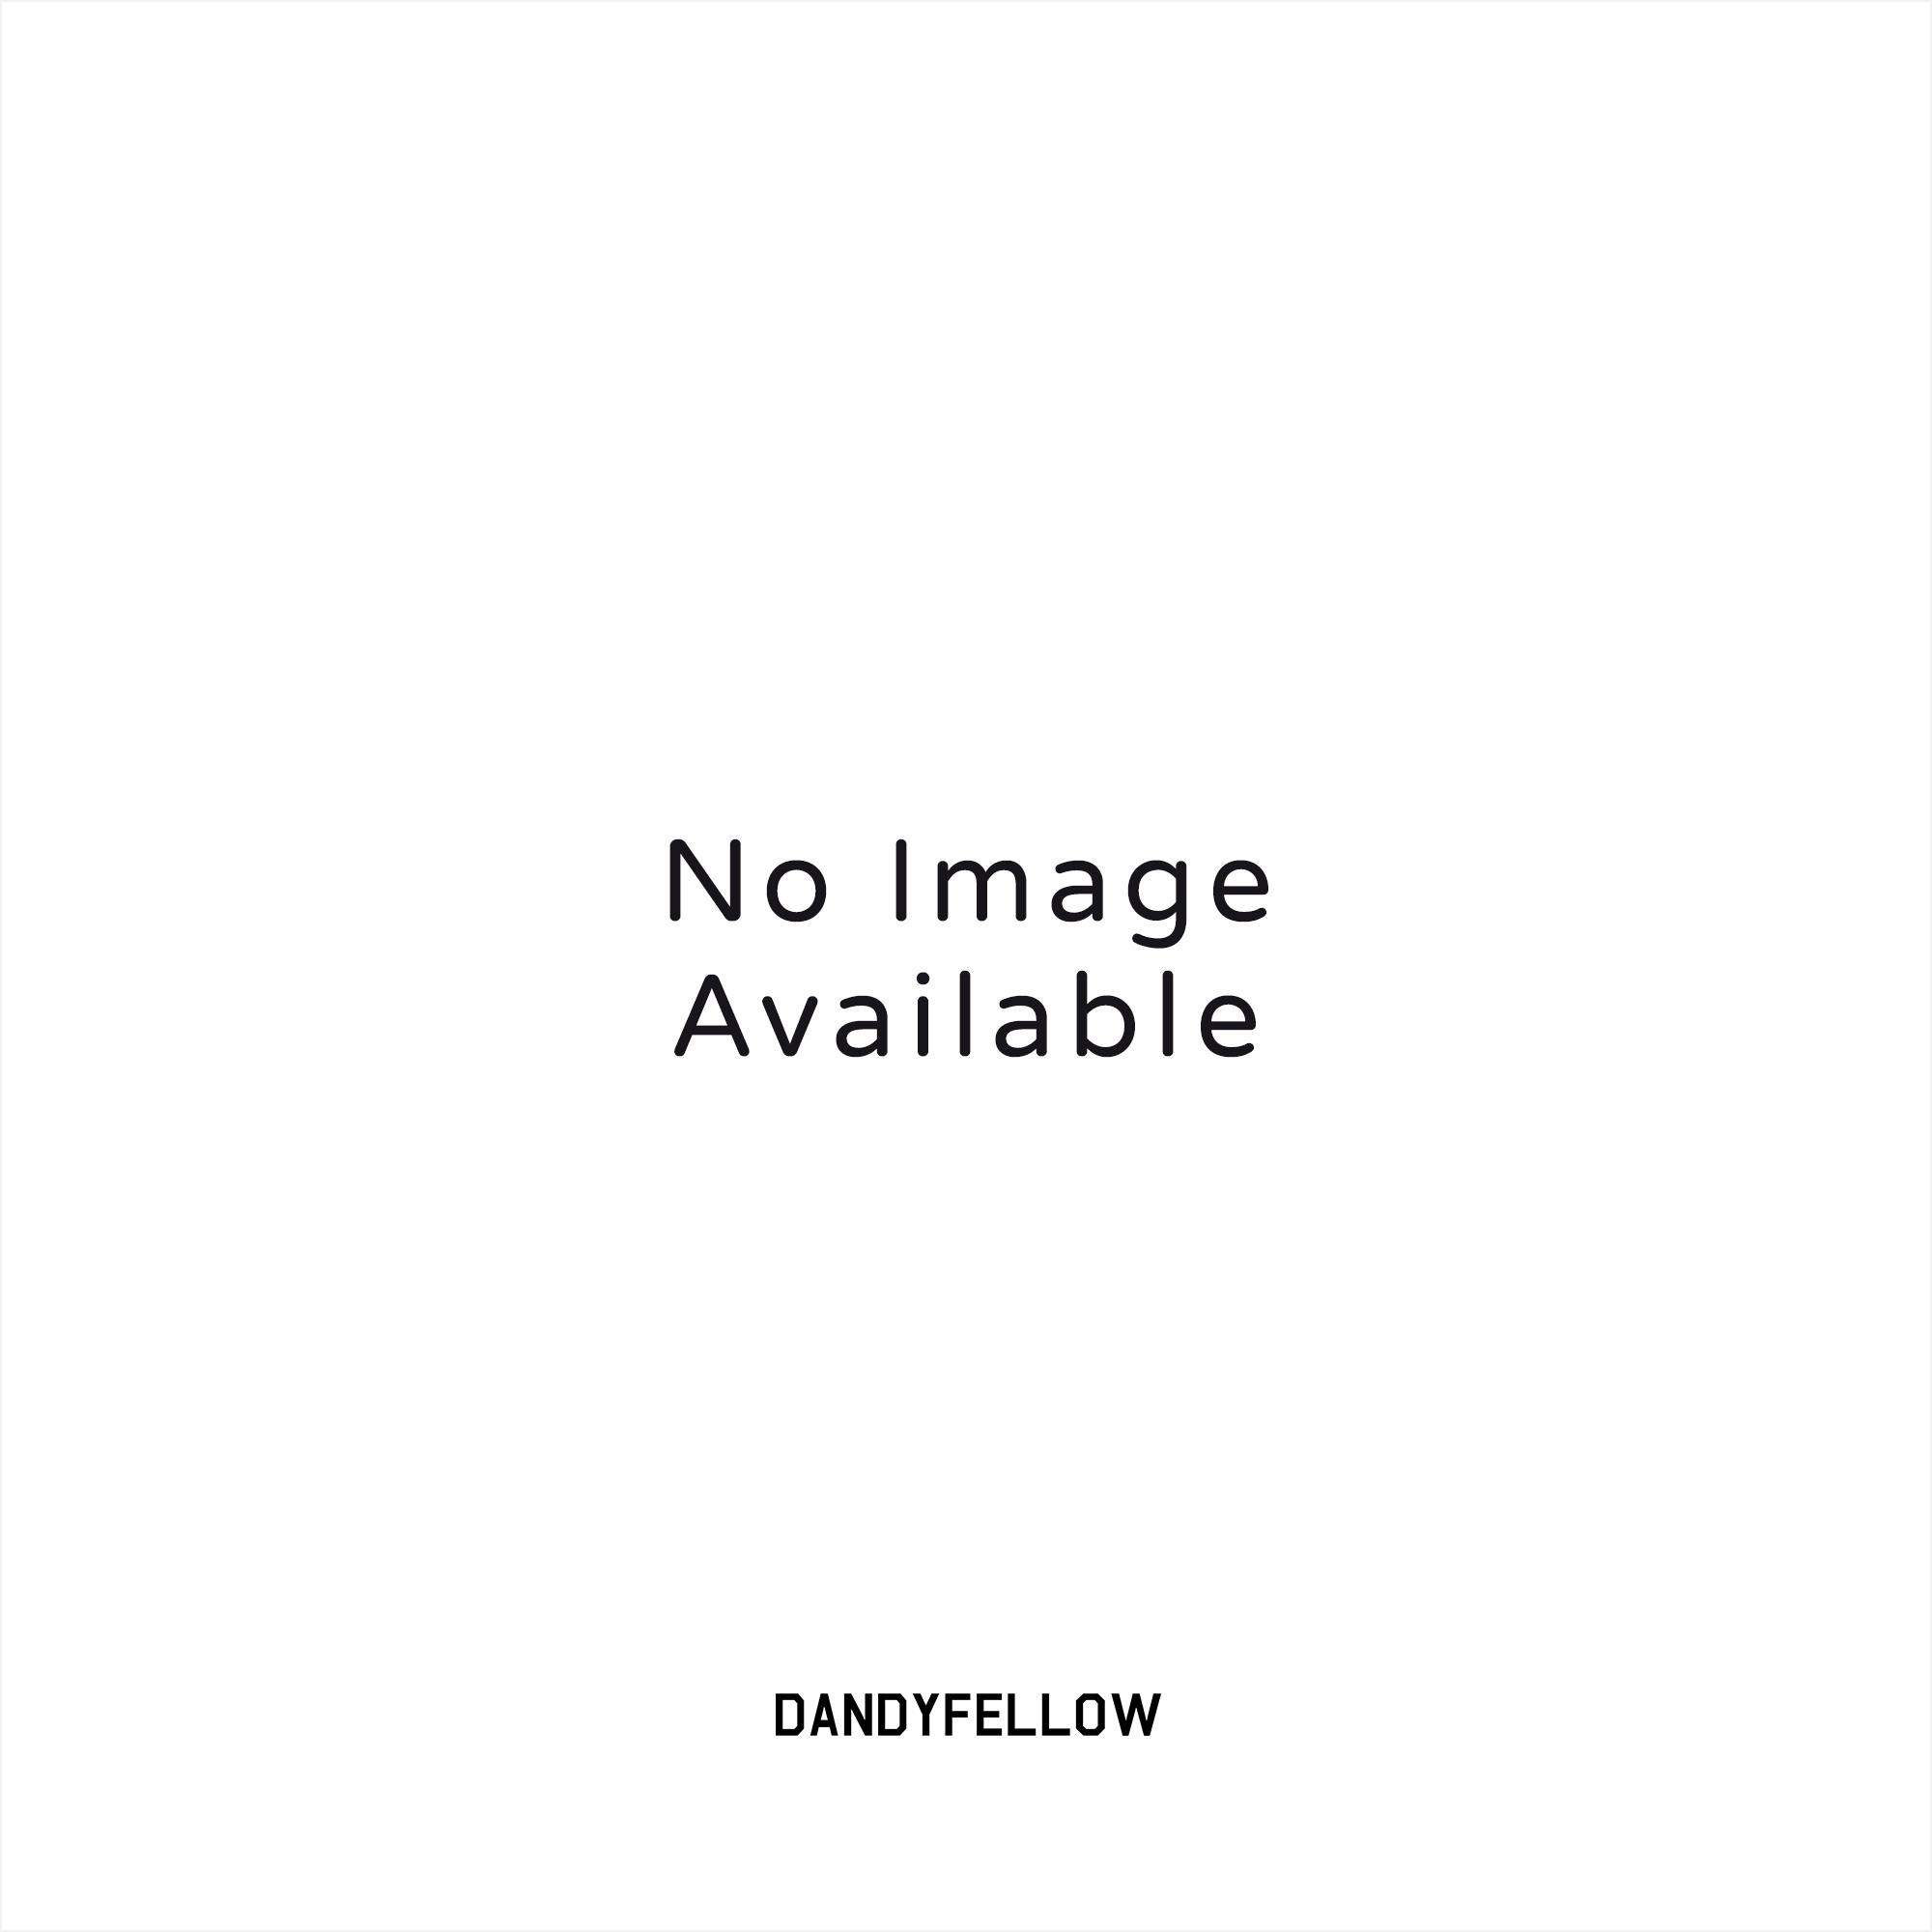 Paul Smith Jeans Faded Dot Navy Jumper JLFJ-692